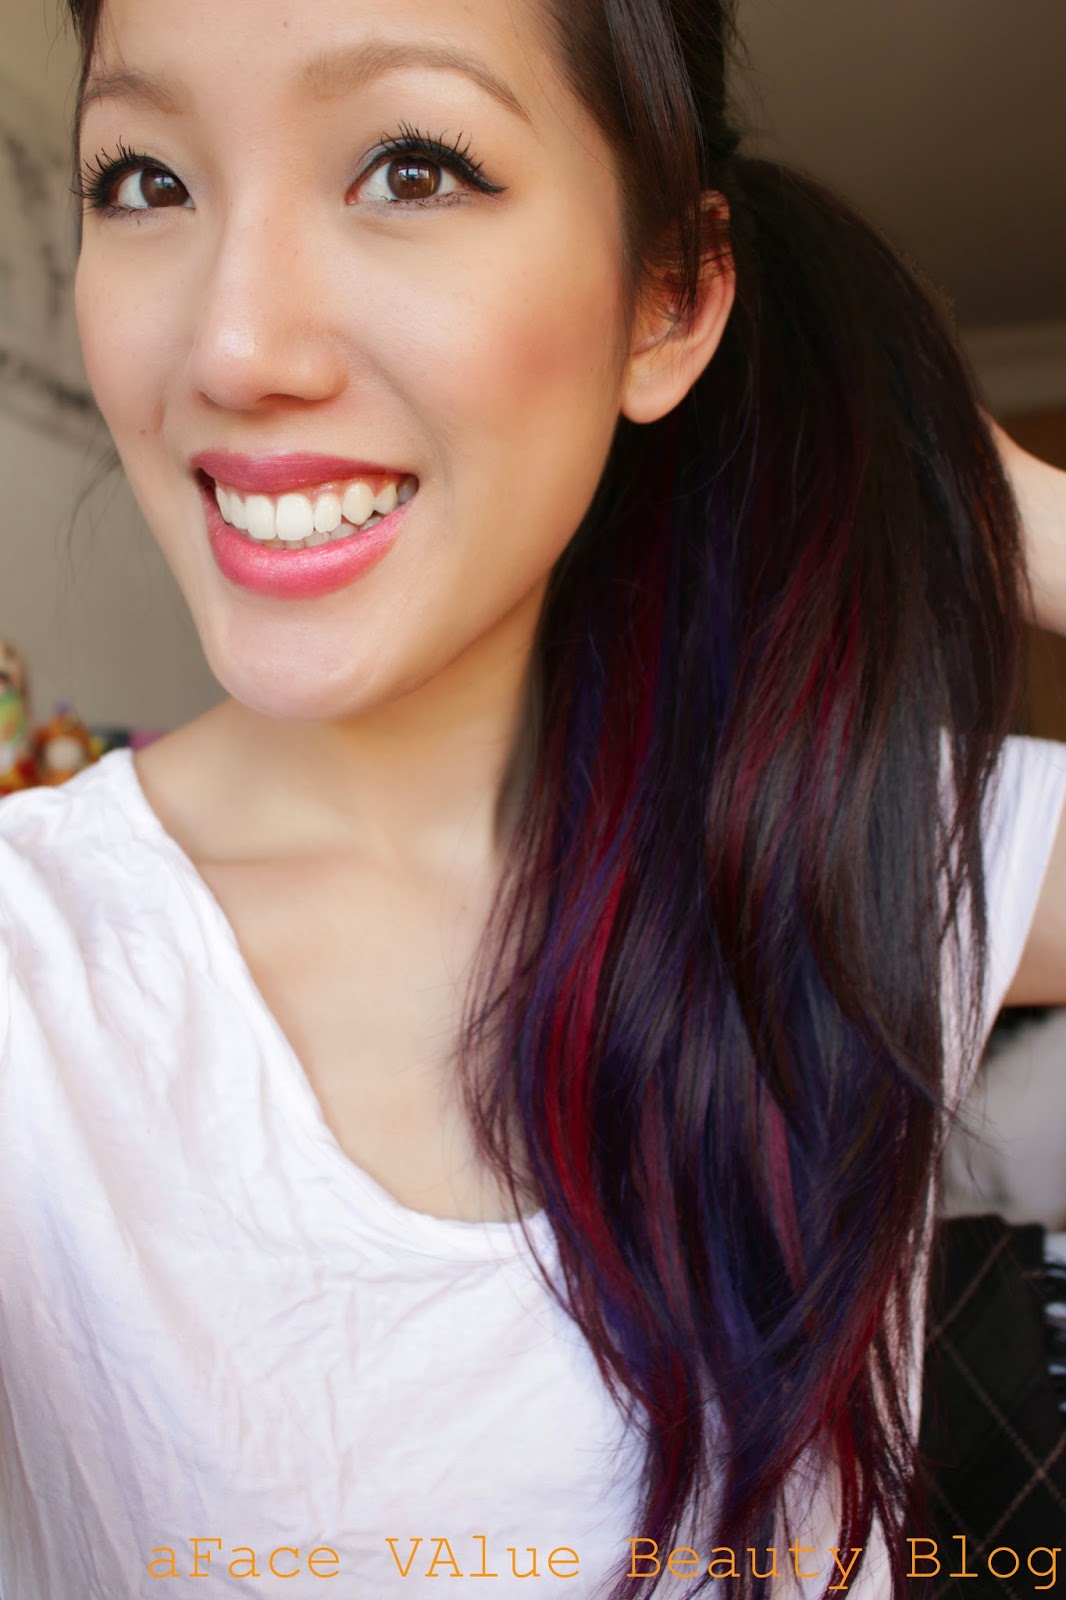 Face Value Beauty Blog: My Quest For Purple Hair via BLEACH LONDON.